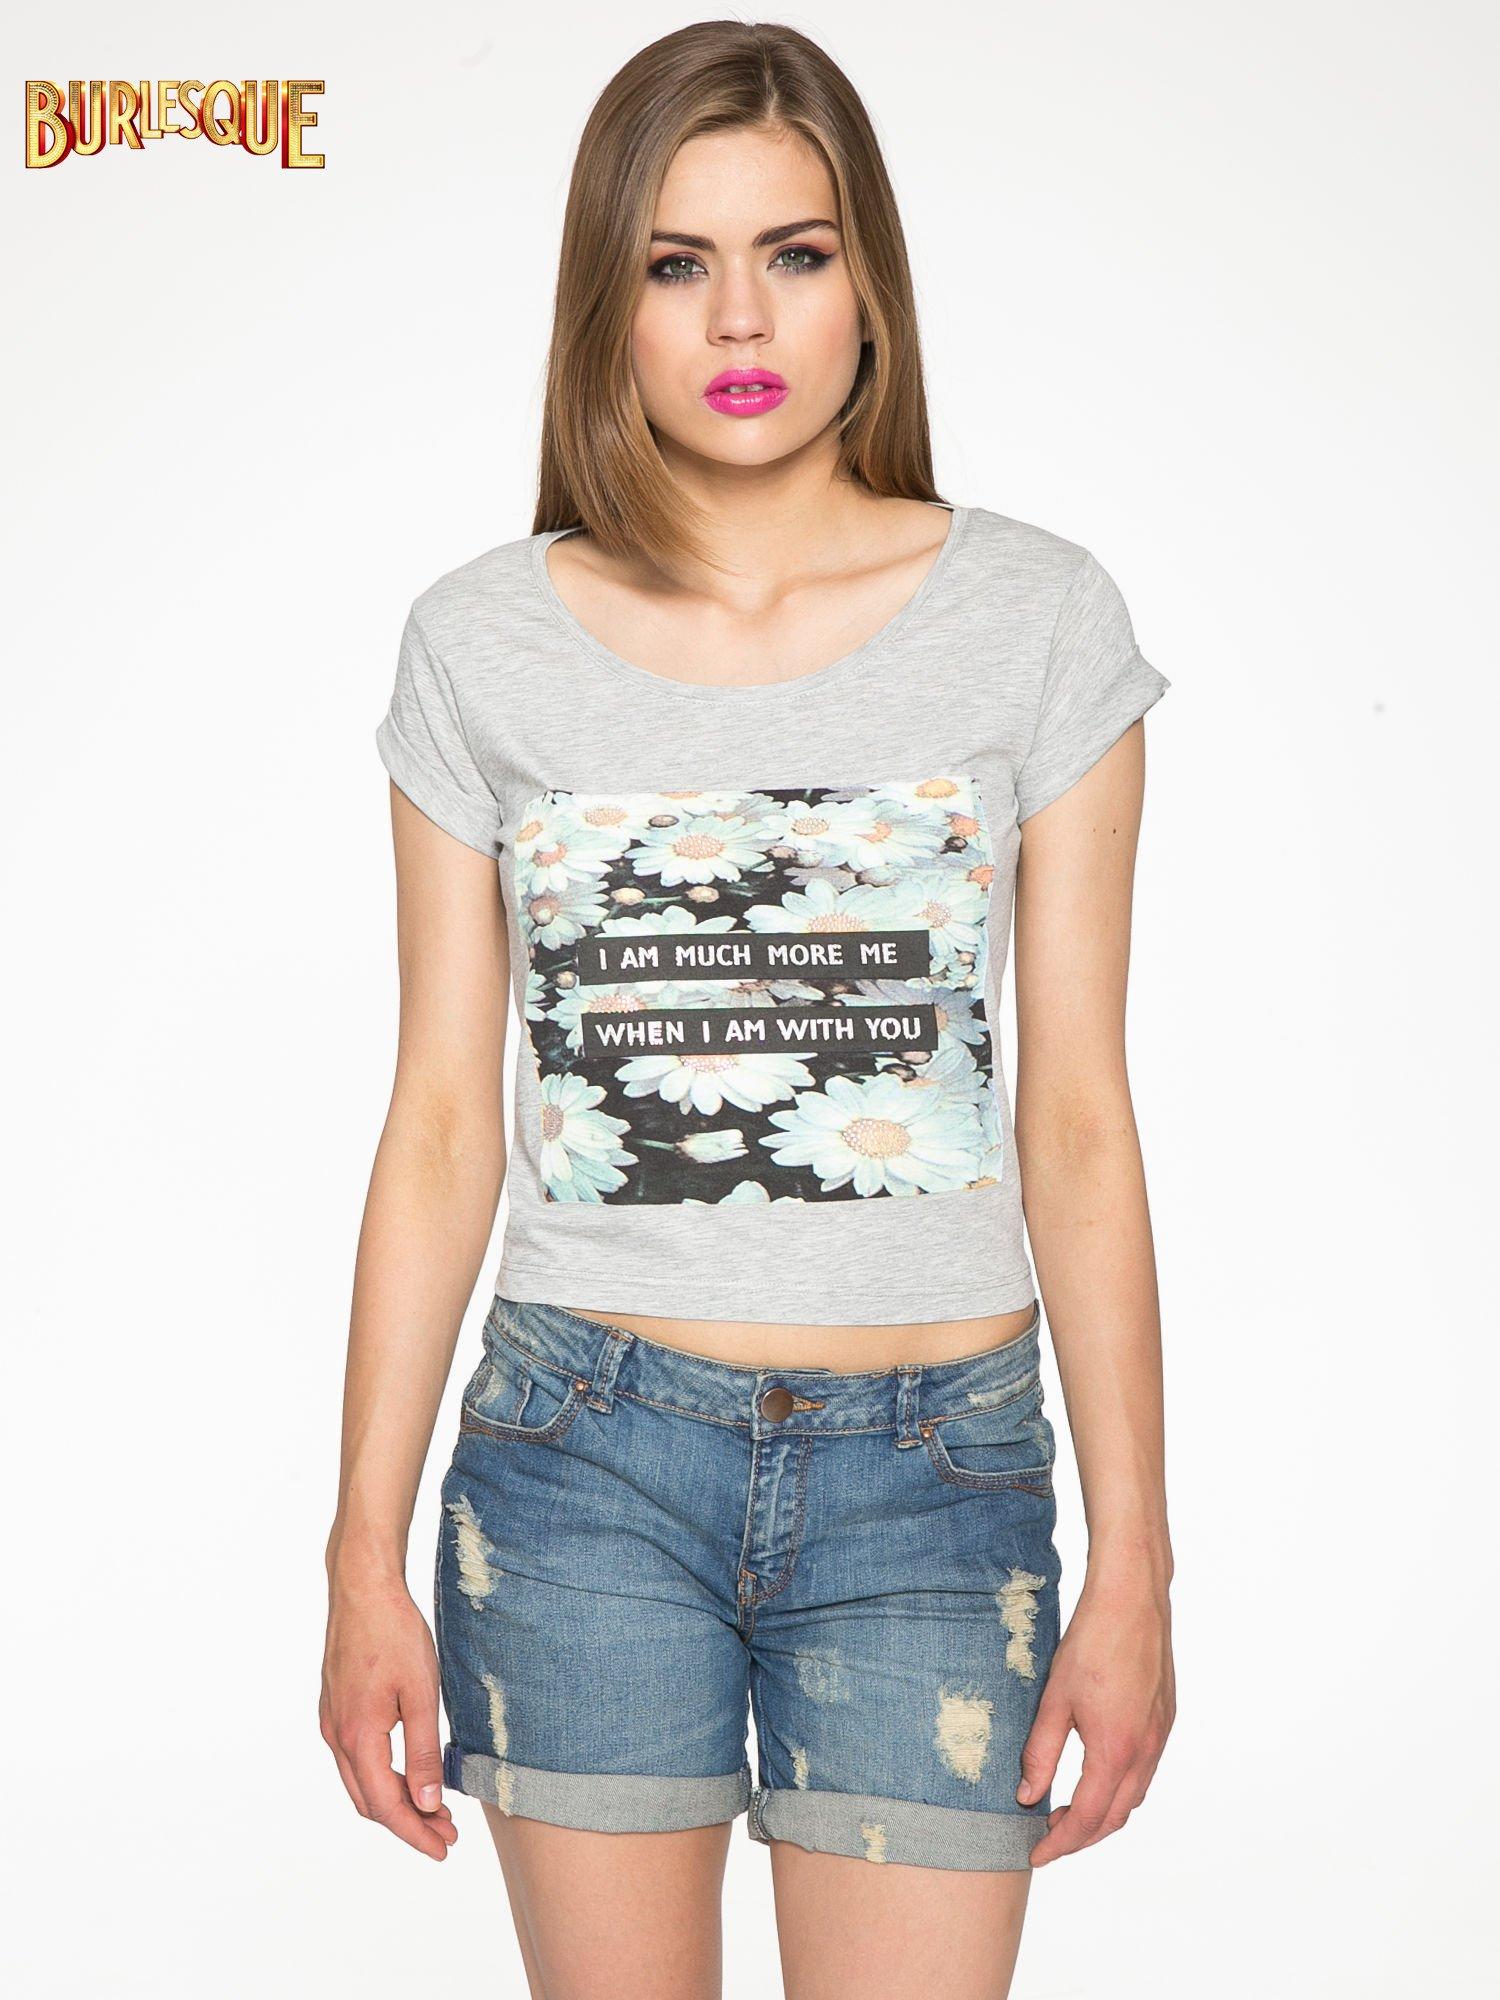 Szary krótki t-shirt z nadrukiem stokrotek i napisem                                  zdj.                                  12